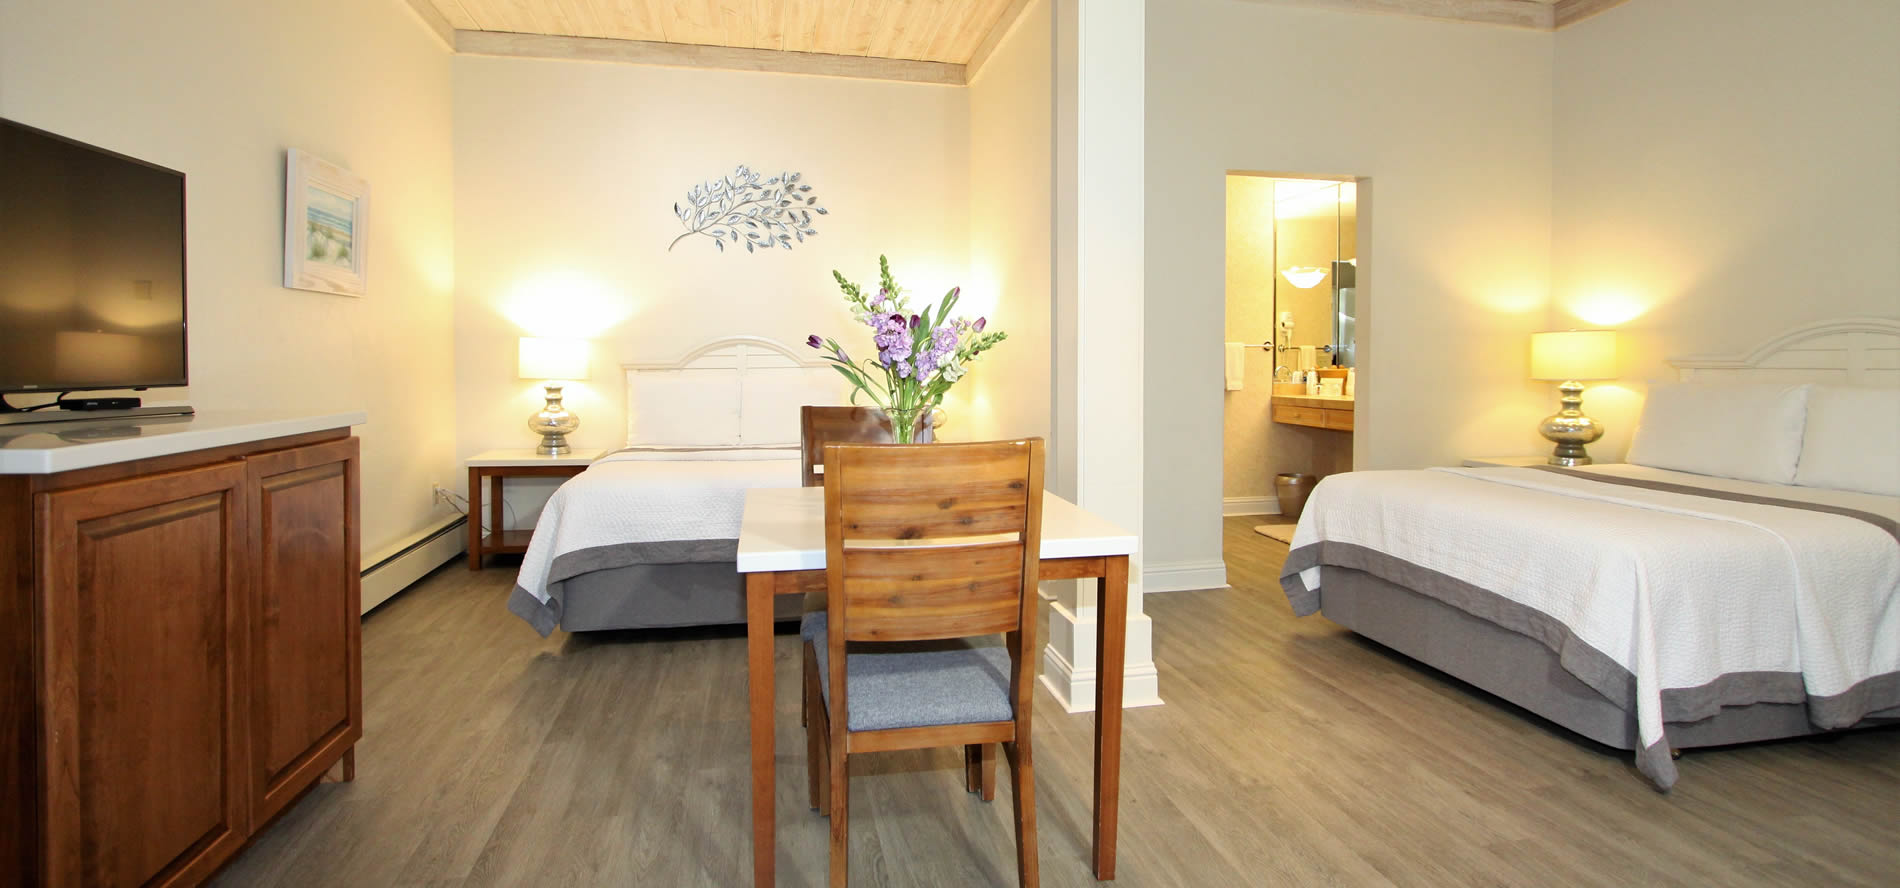 intermediate double bed room